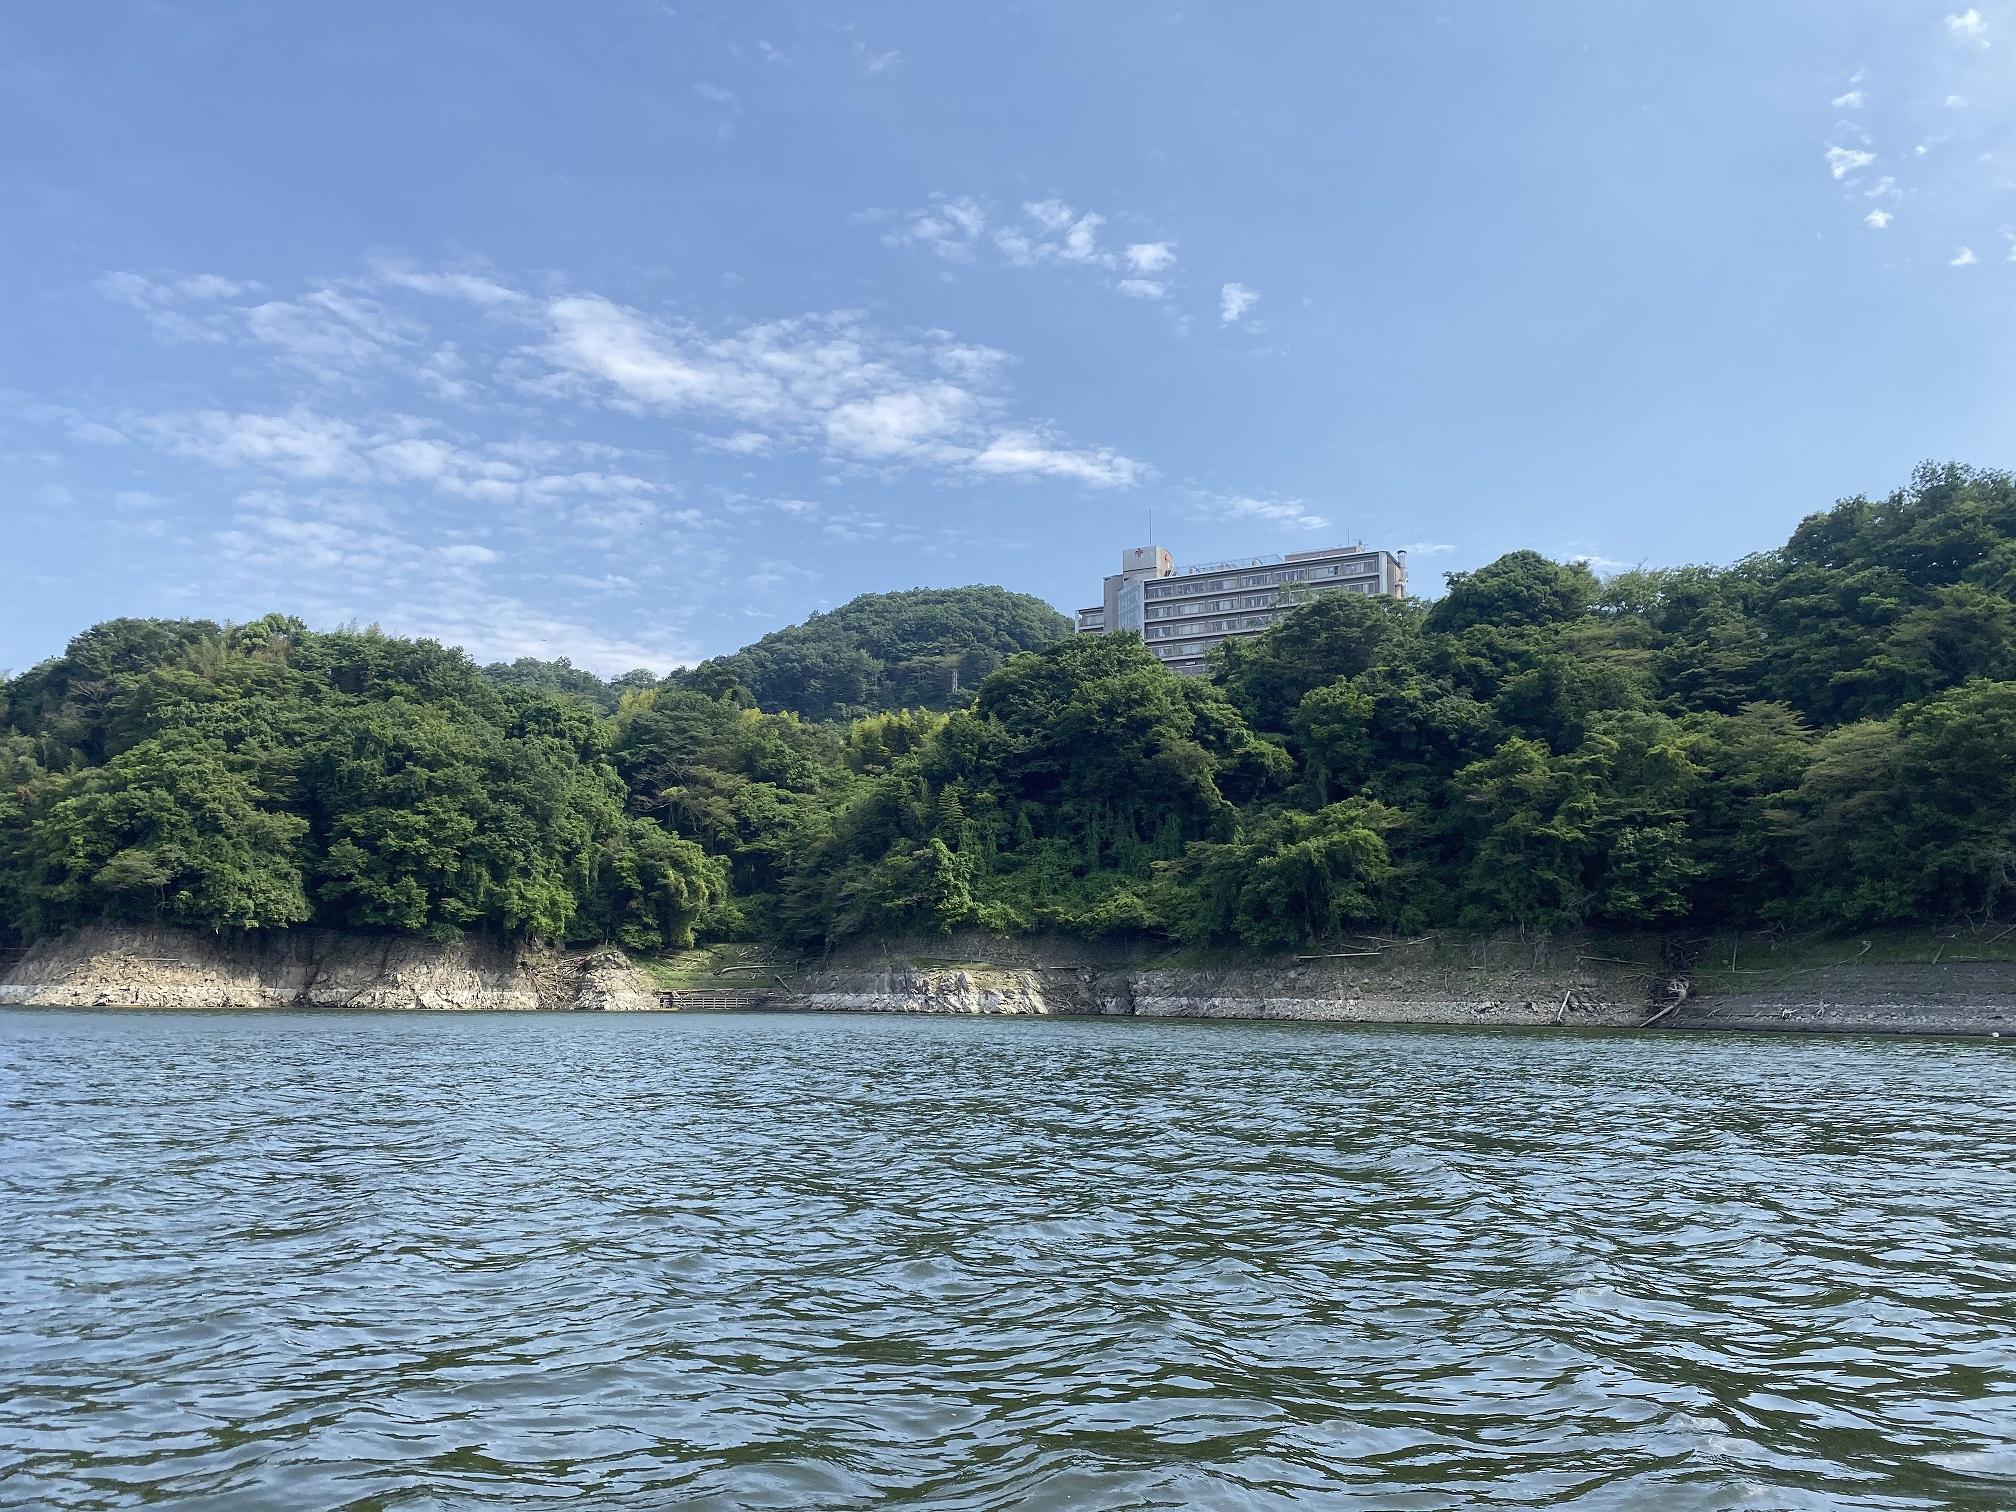 津久井湖 バス釣り 日赤下 全景